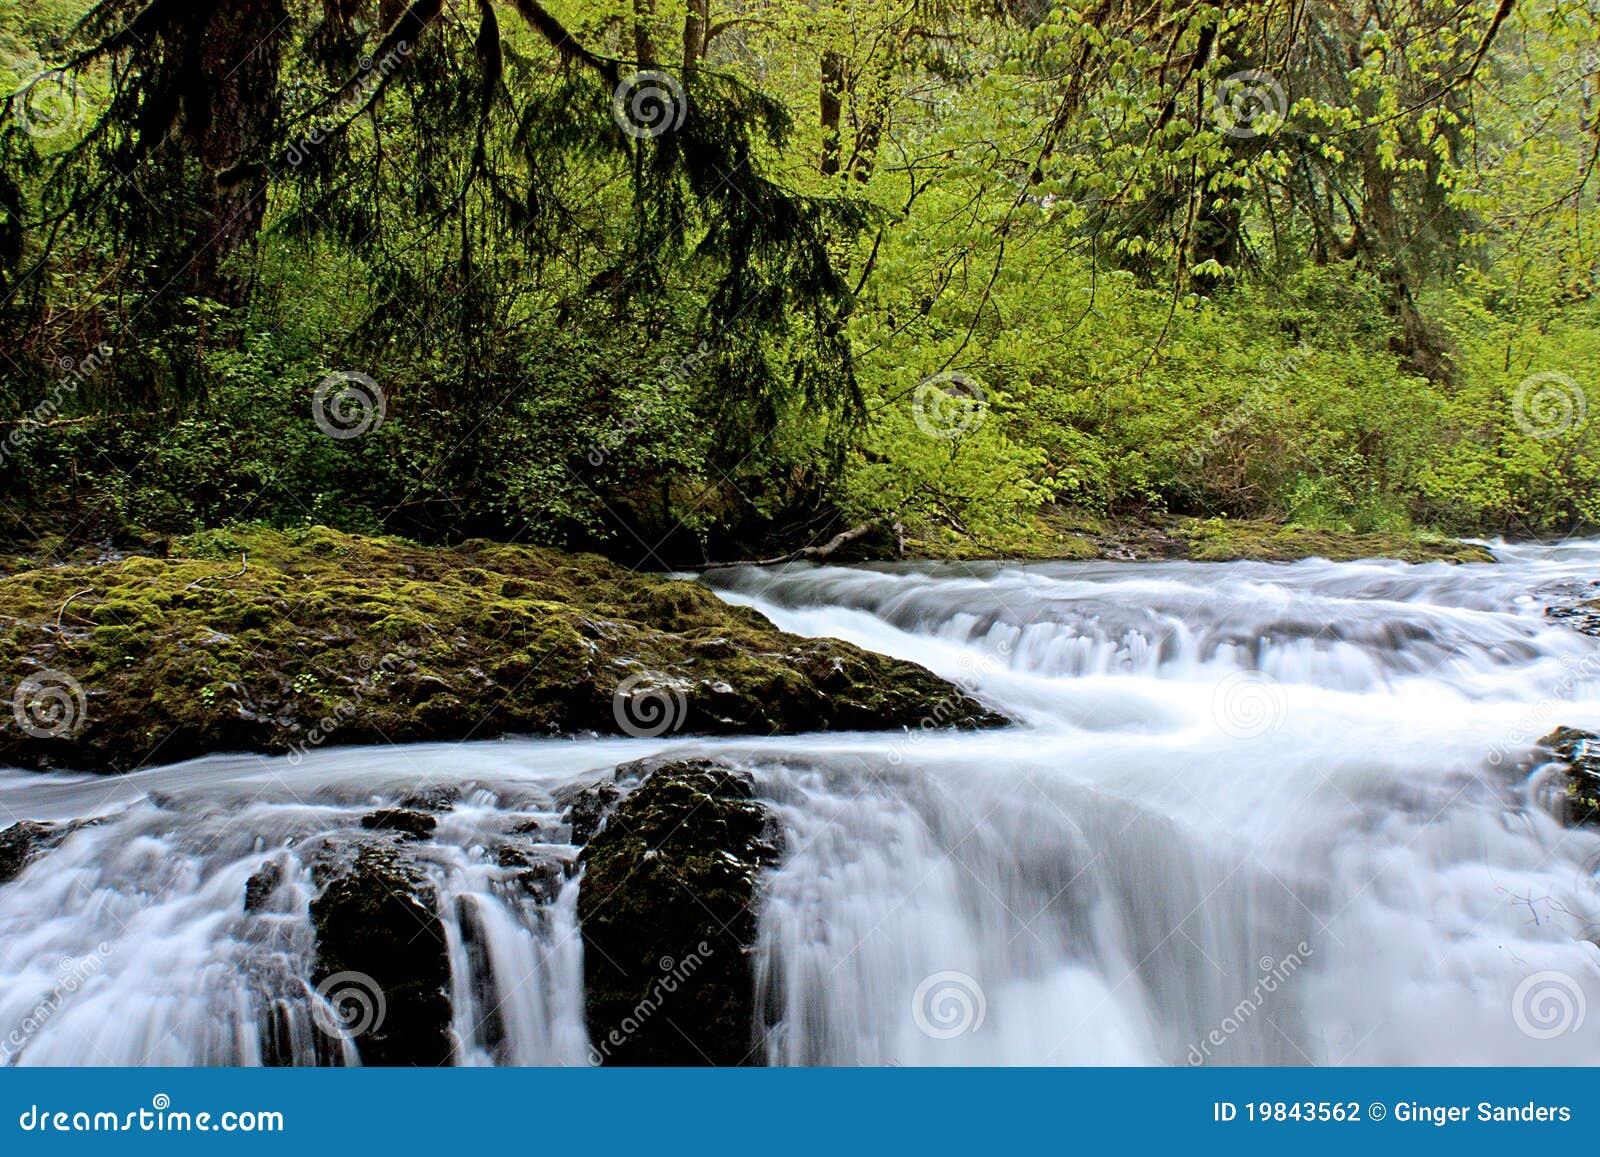 Slow Water Falling Off Rocks In A Green Forest